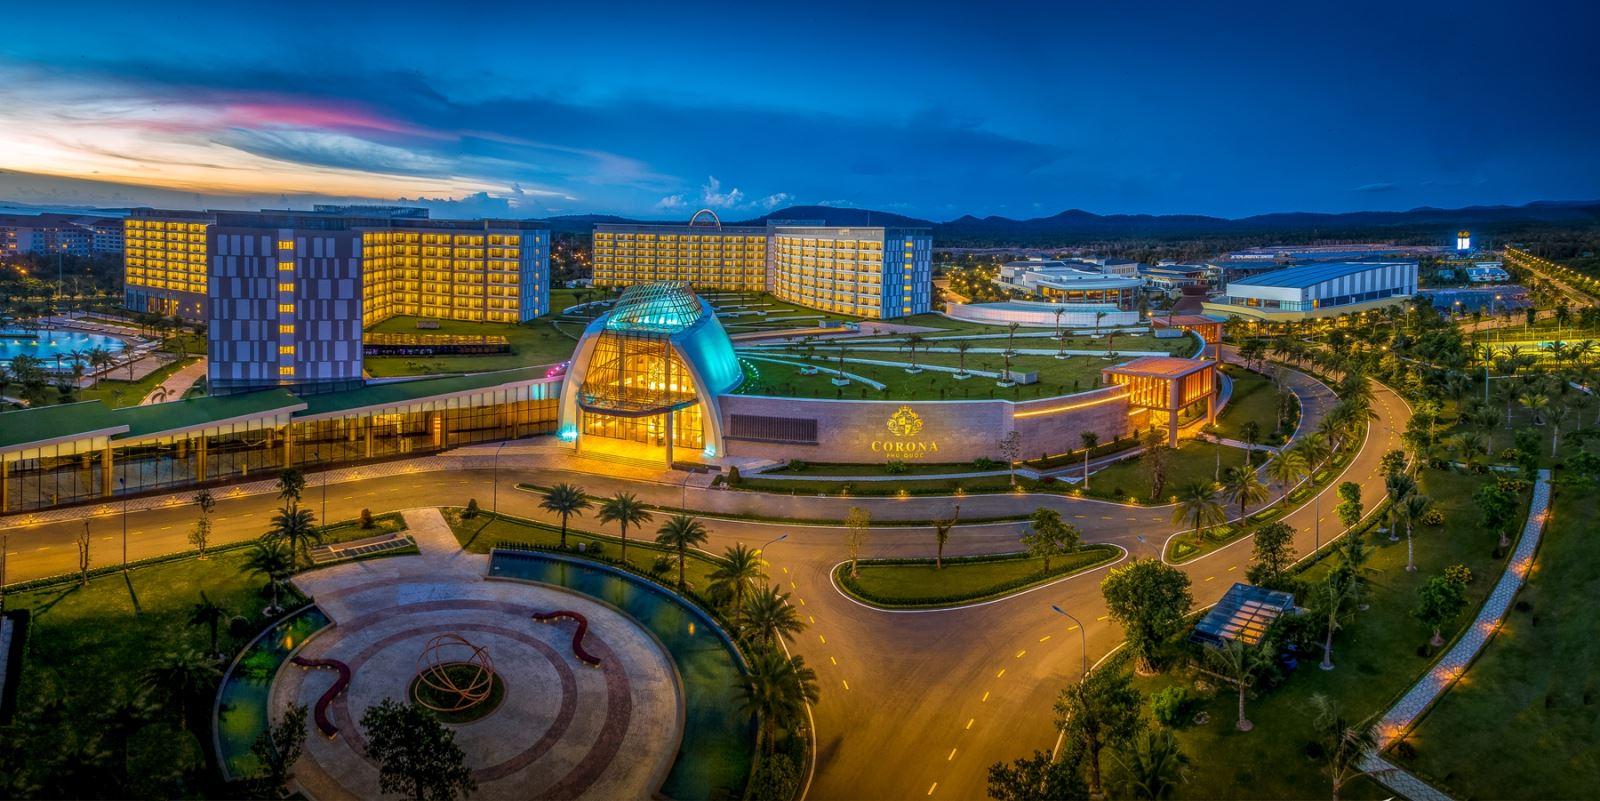 phoi-canh-casino-corona-phu-quoc